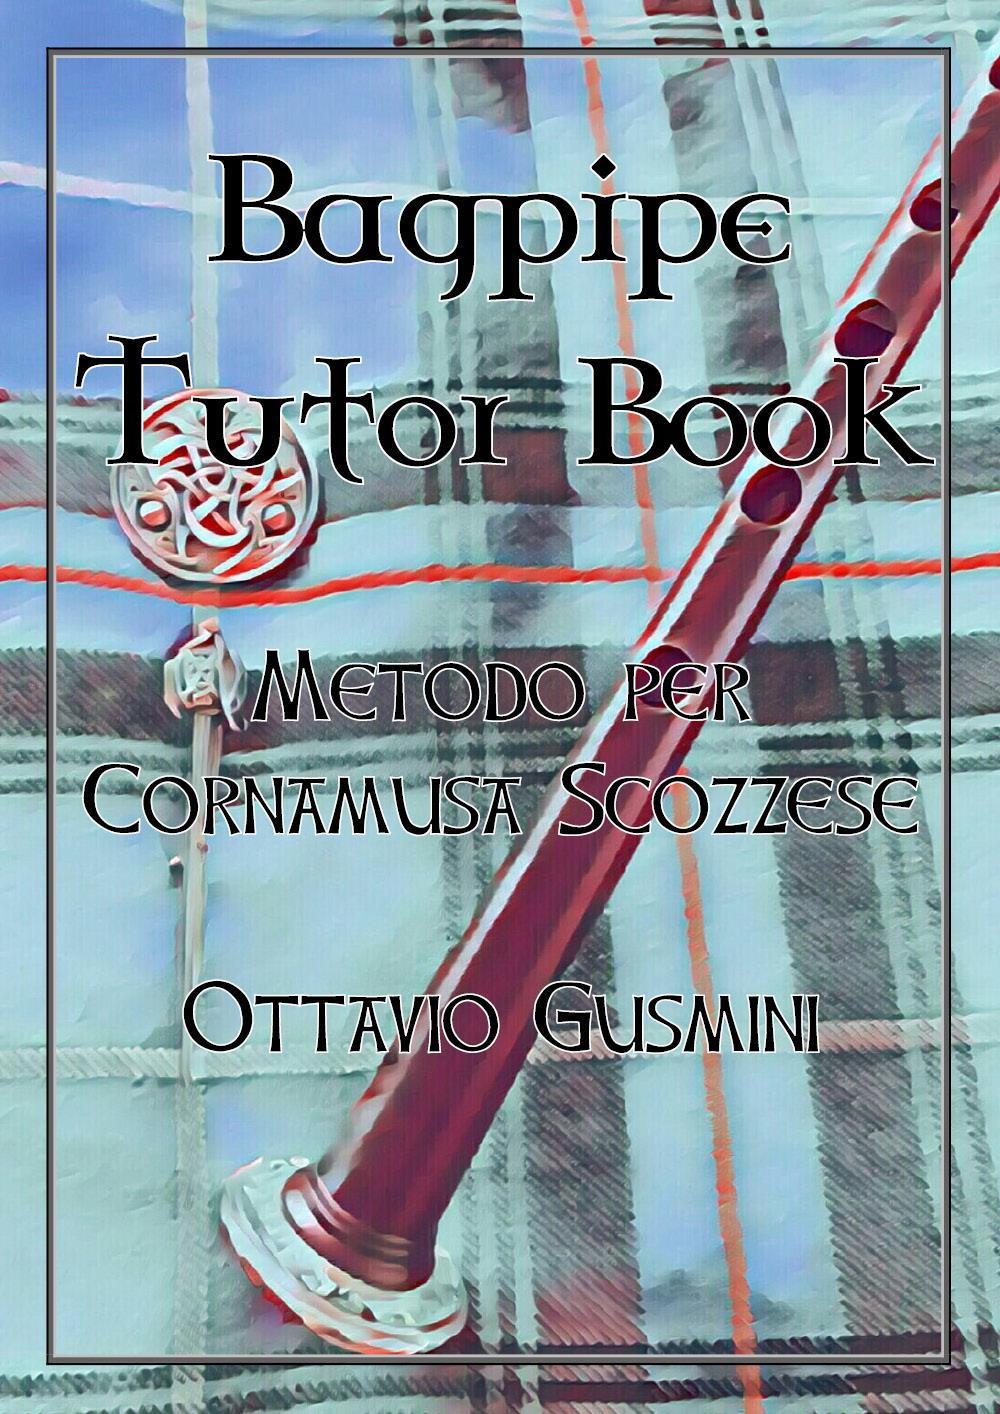 BAGPIPE TUTOR BOOK - Metodo per Cornamusa Scozzese